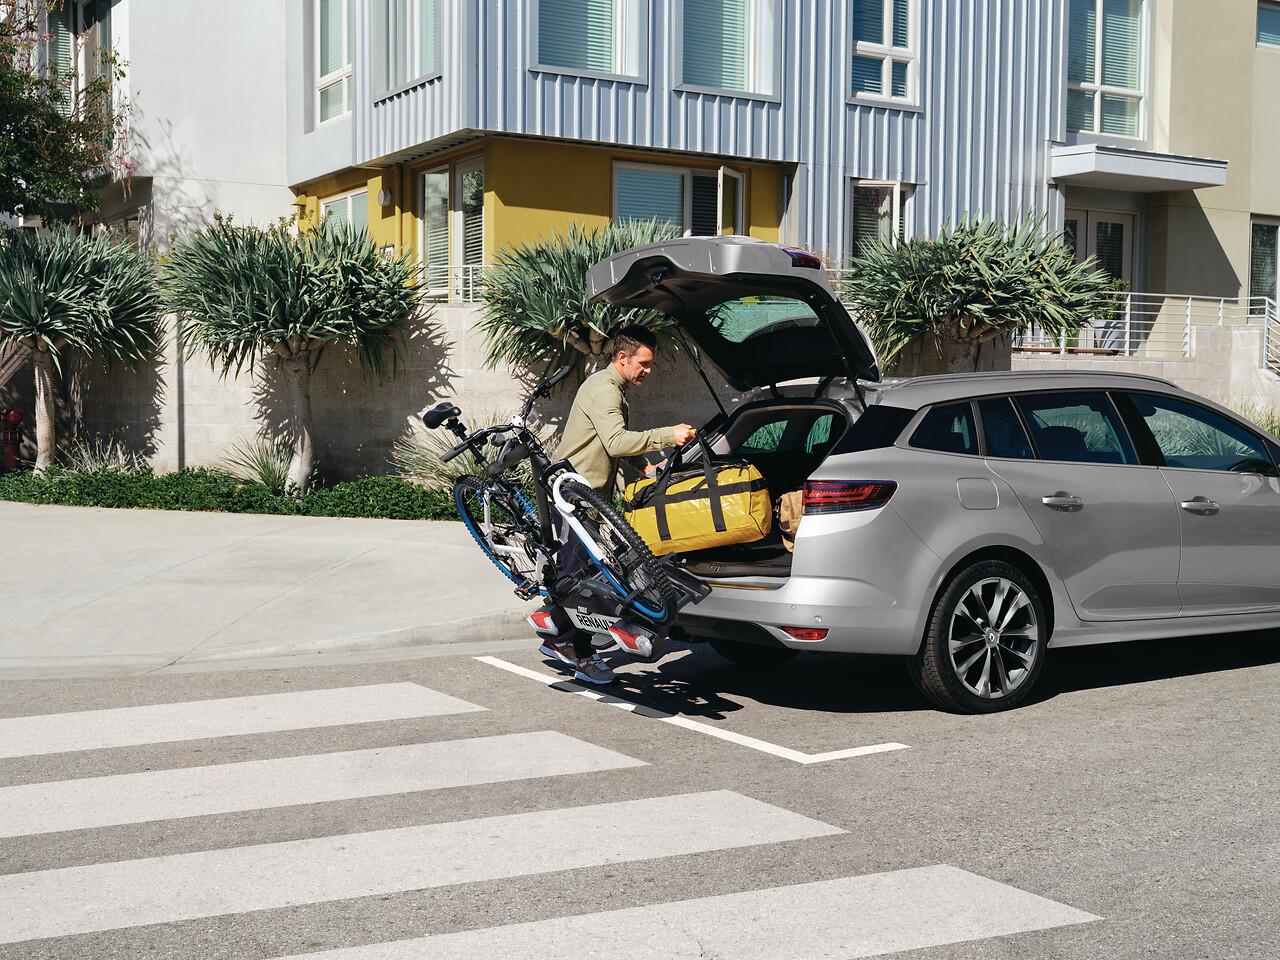 Porte-vélo - Porte-vélos Euroride - Sur attelage - 2 vélos 7 broches